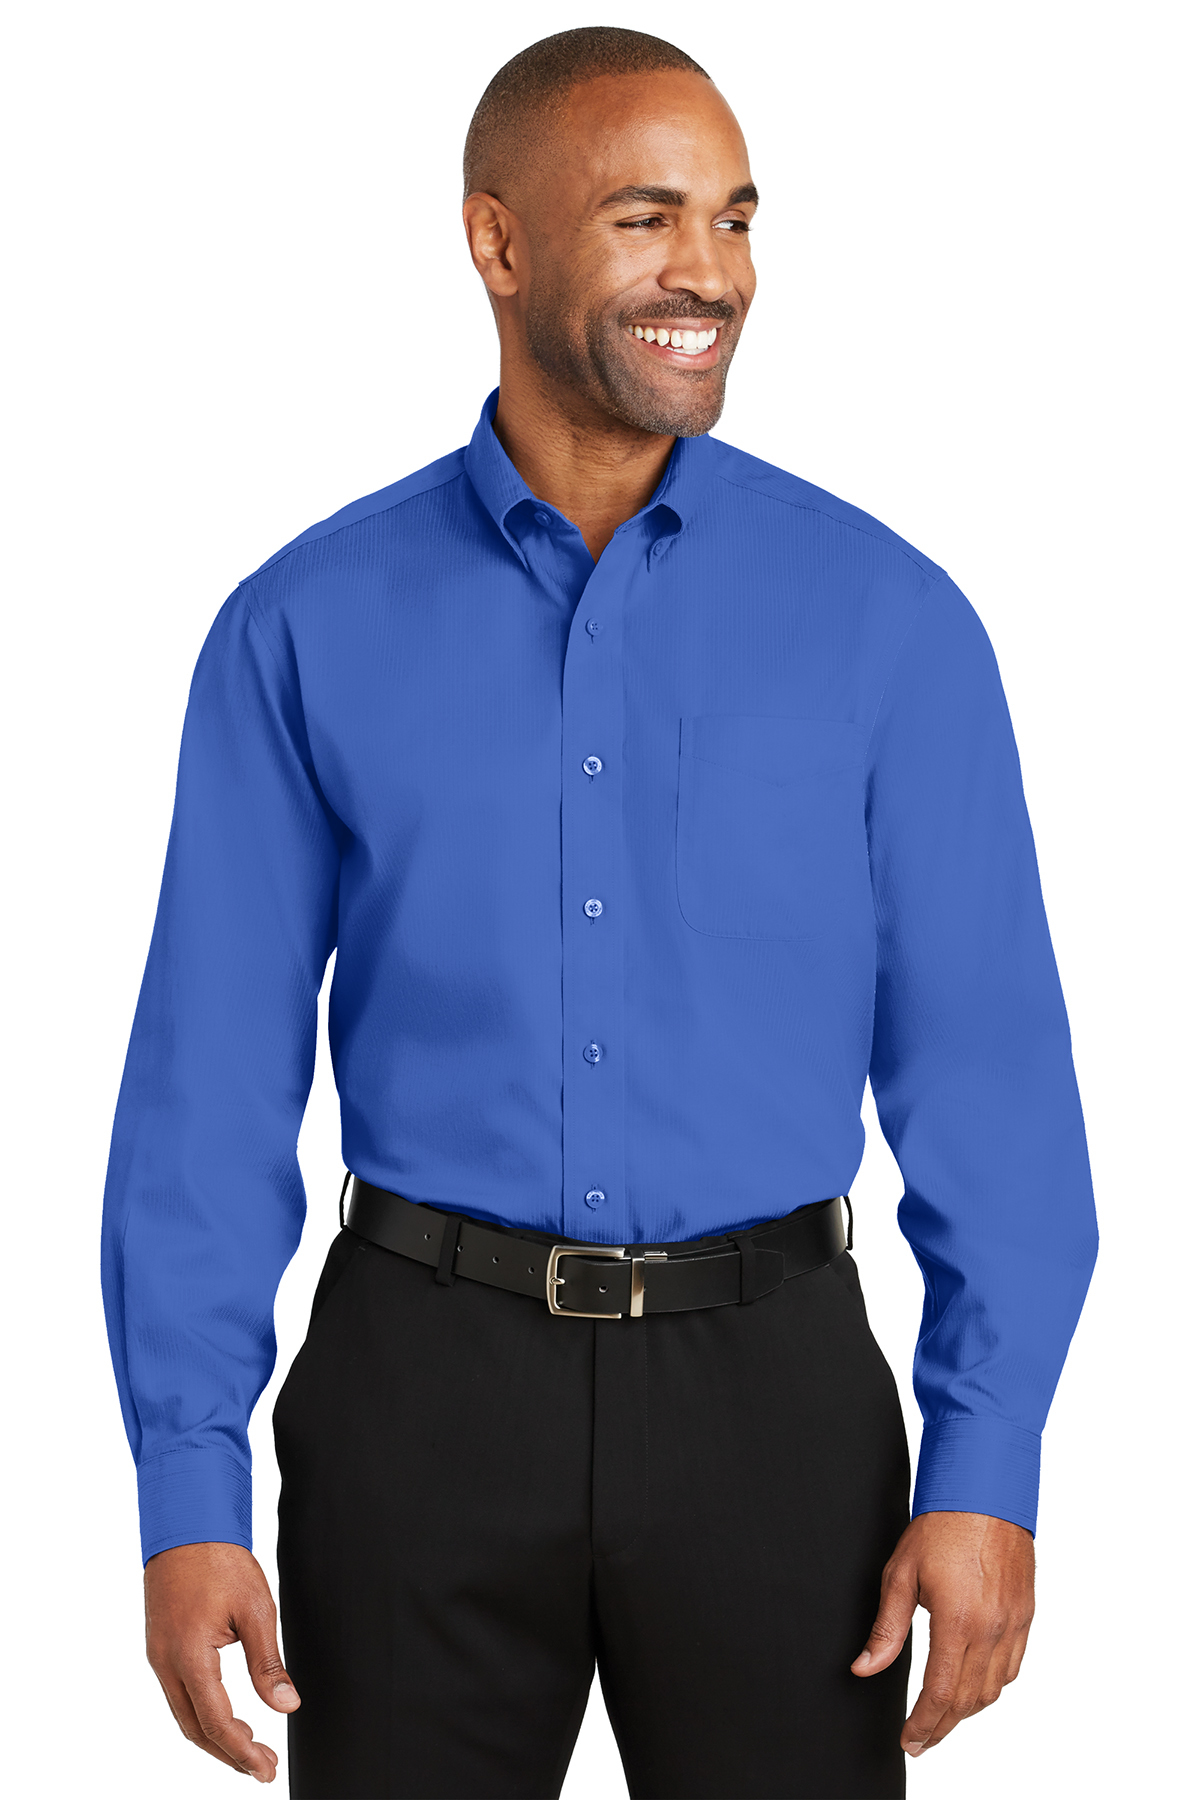 eb501285f49 Red House® - Dobby Non-Iron Button-Down Shirt | Cotton | Woven ...